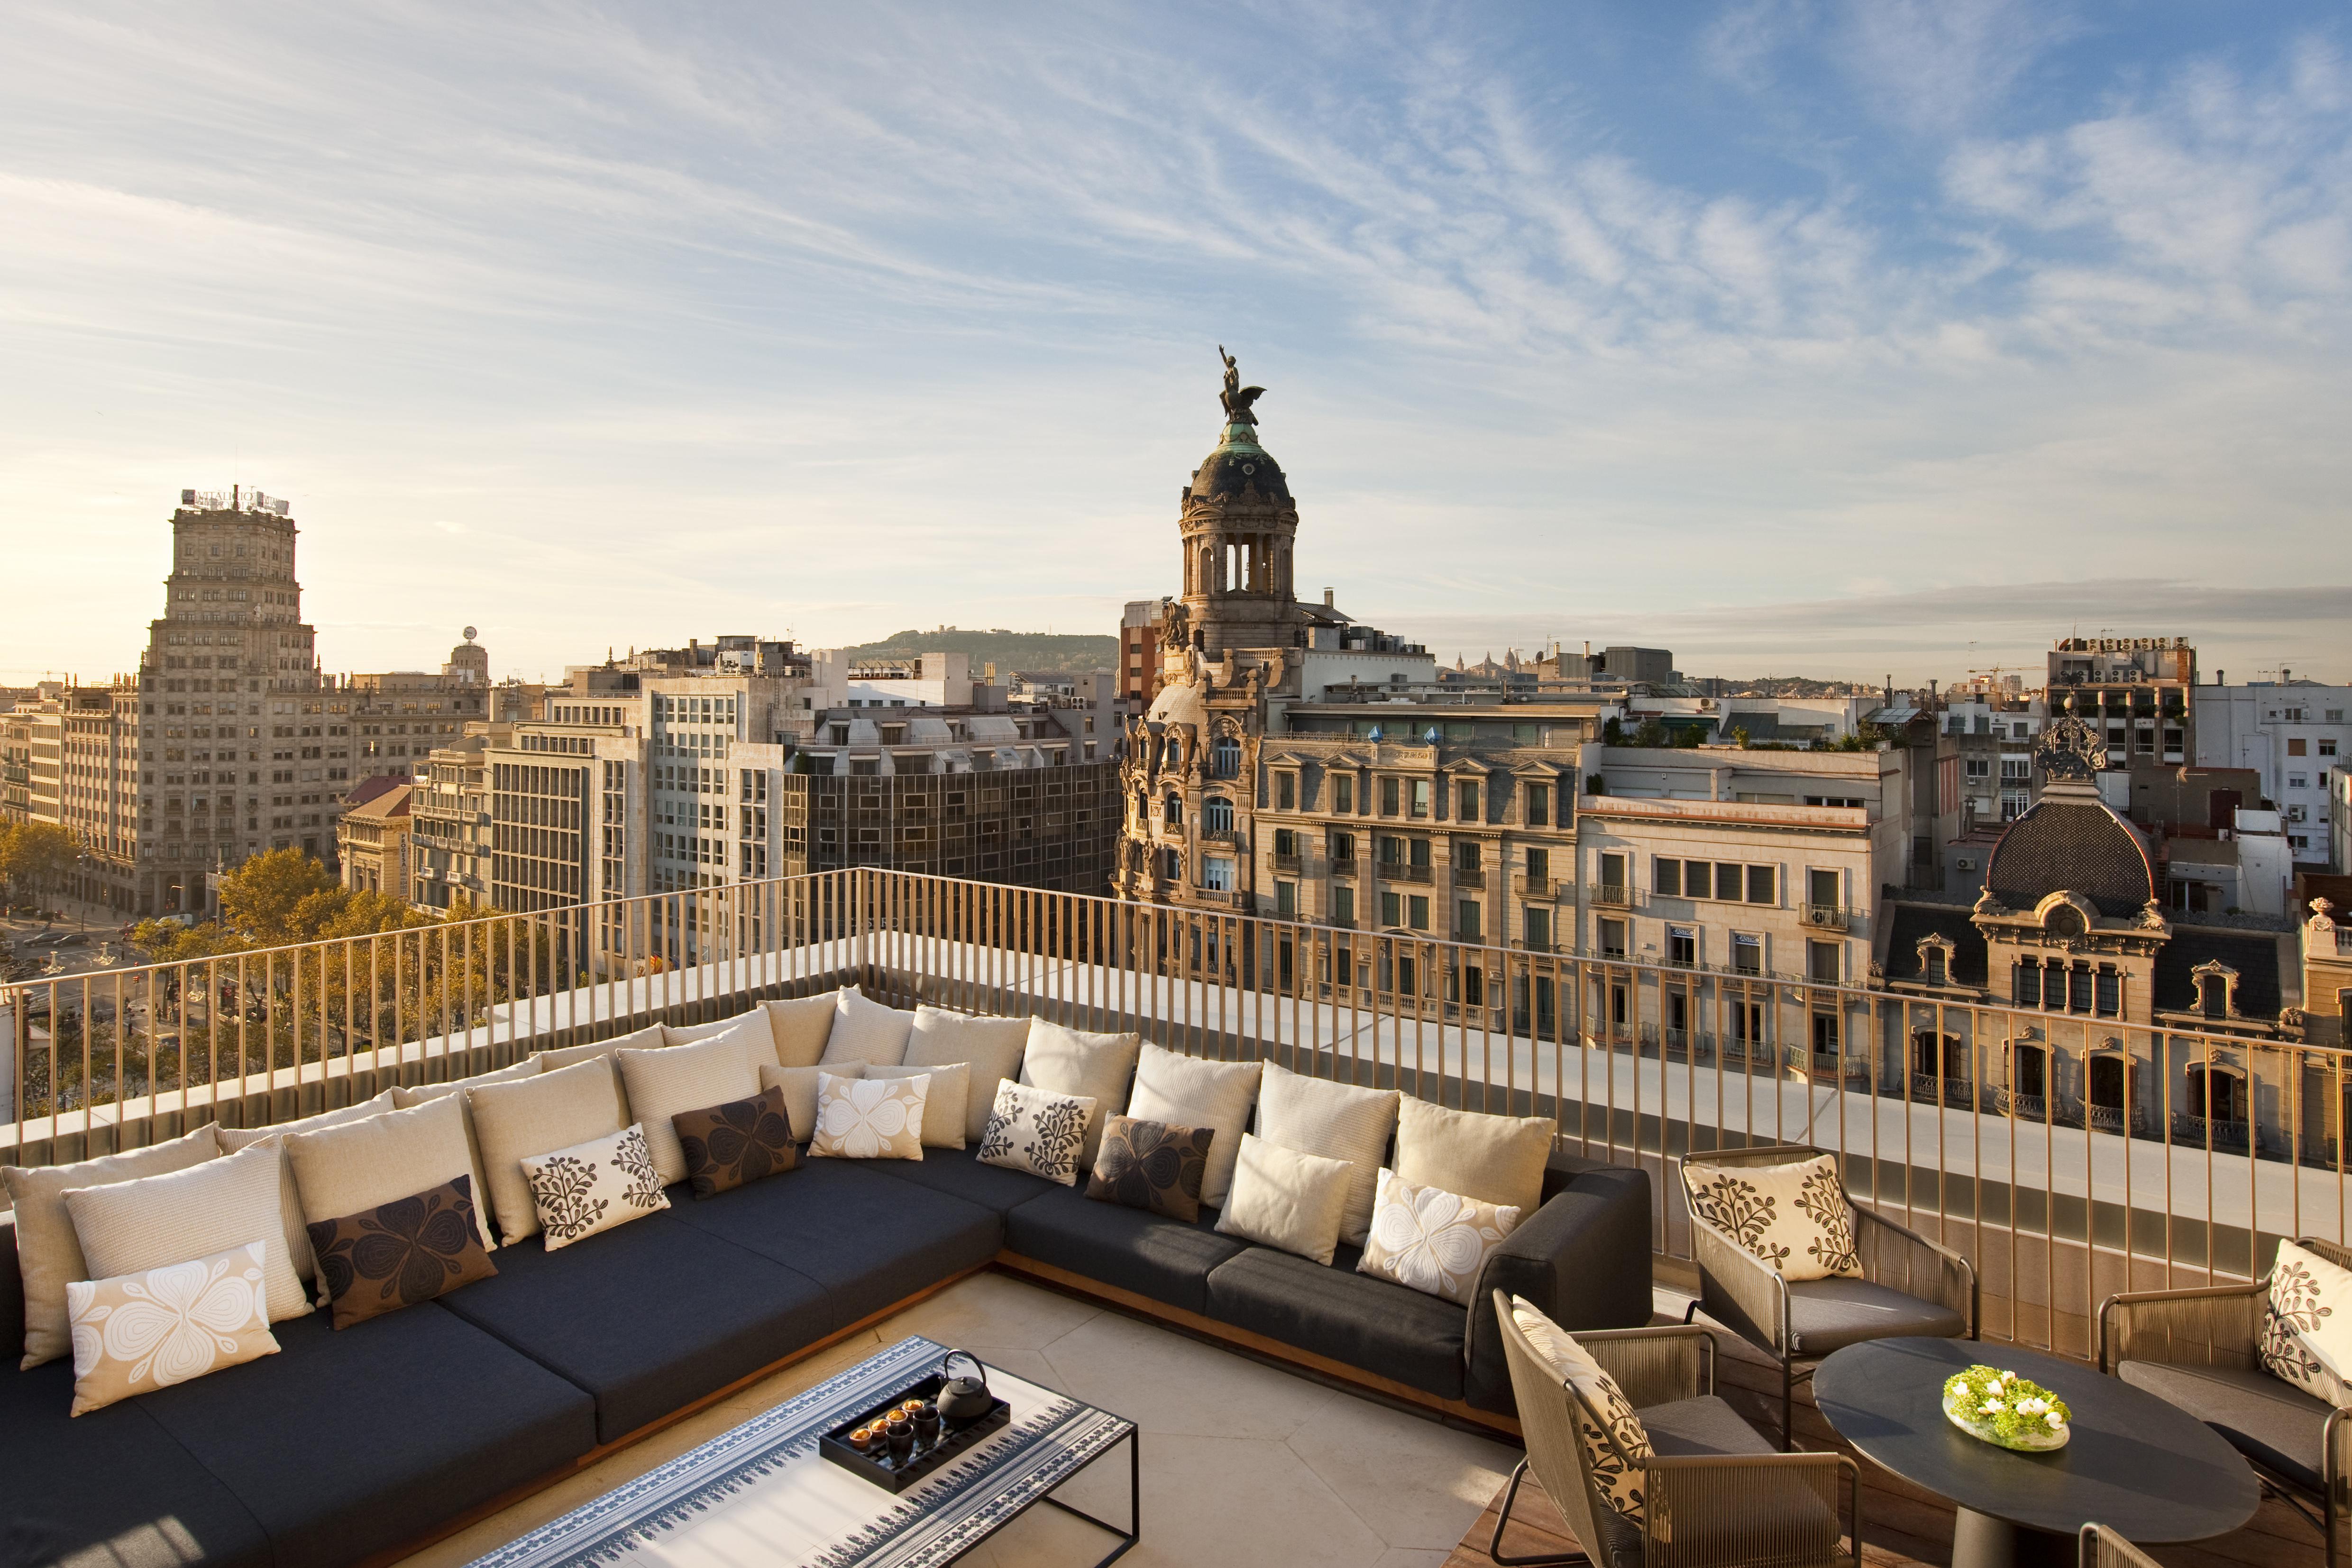 Panoramic Views, Lush Gardens and Michelin Stars at the Mandarin ...